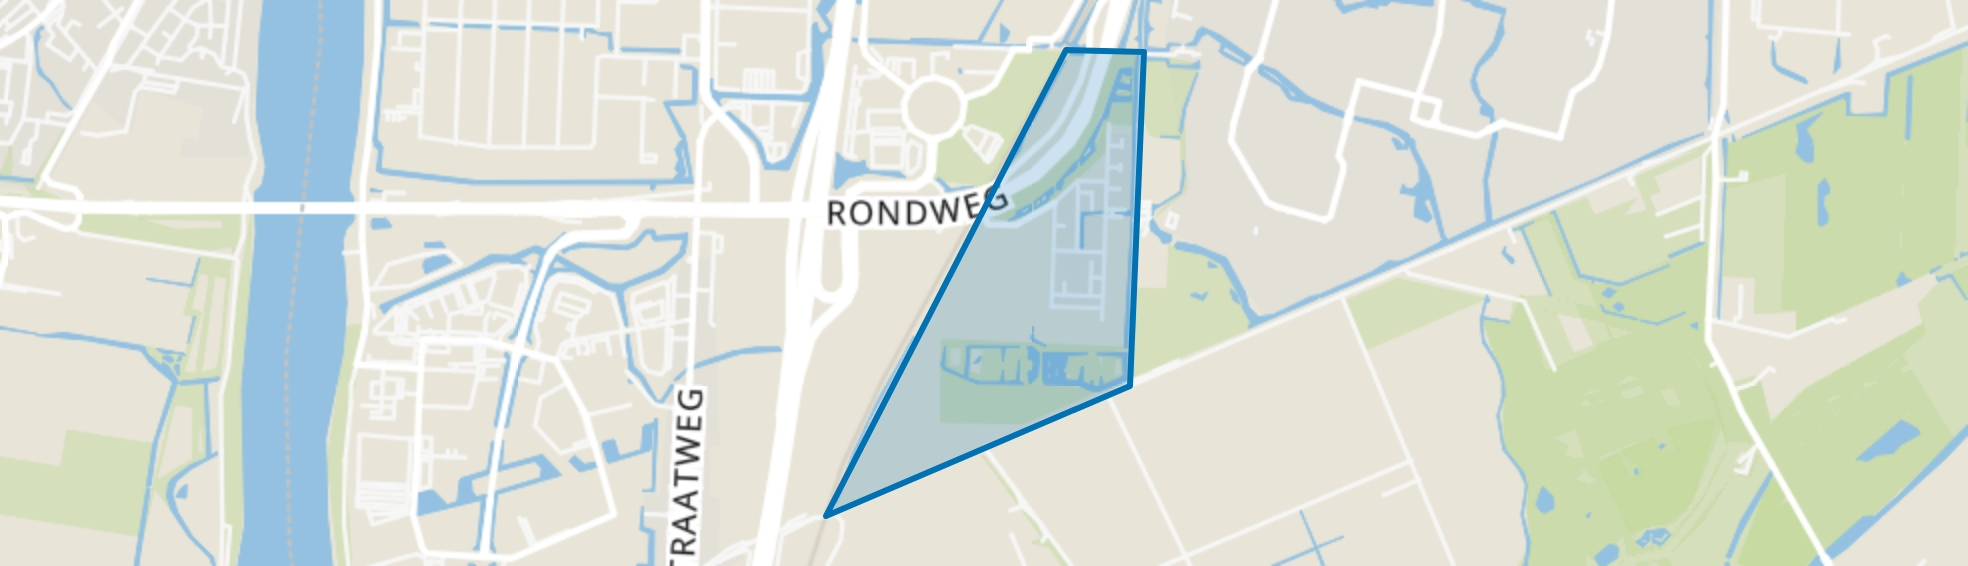 Smitsweg, Dordrecht map